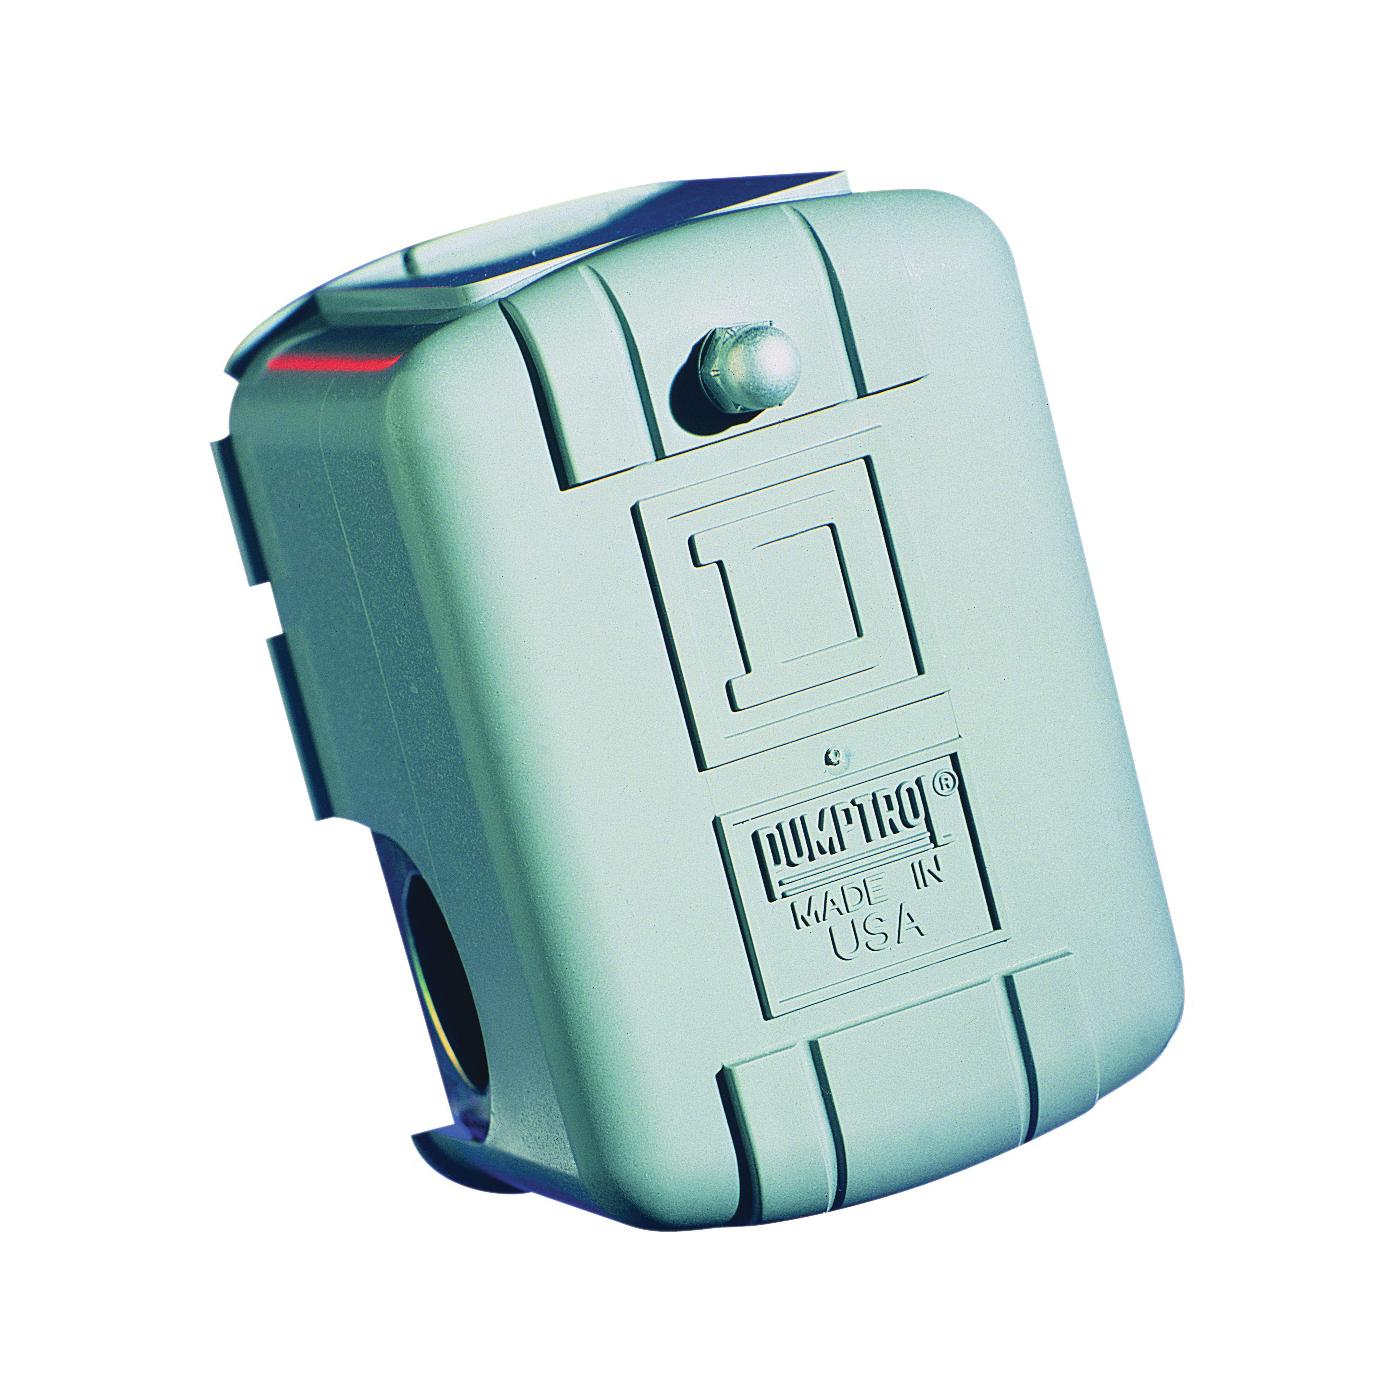 Picture of Square D Pumptrol FSG2J21CP Pressure Switch, 1-Phase, 115/230 V, 2-Pole, 220 psi Working, NEMA 1 Enclosure